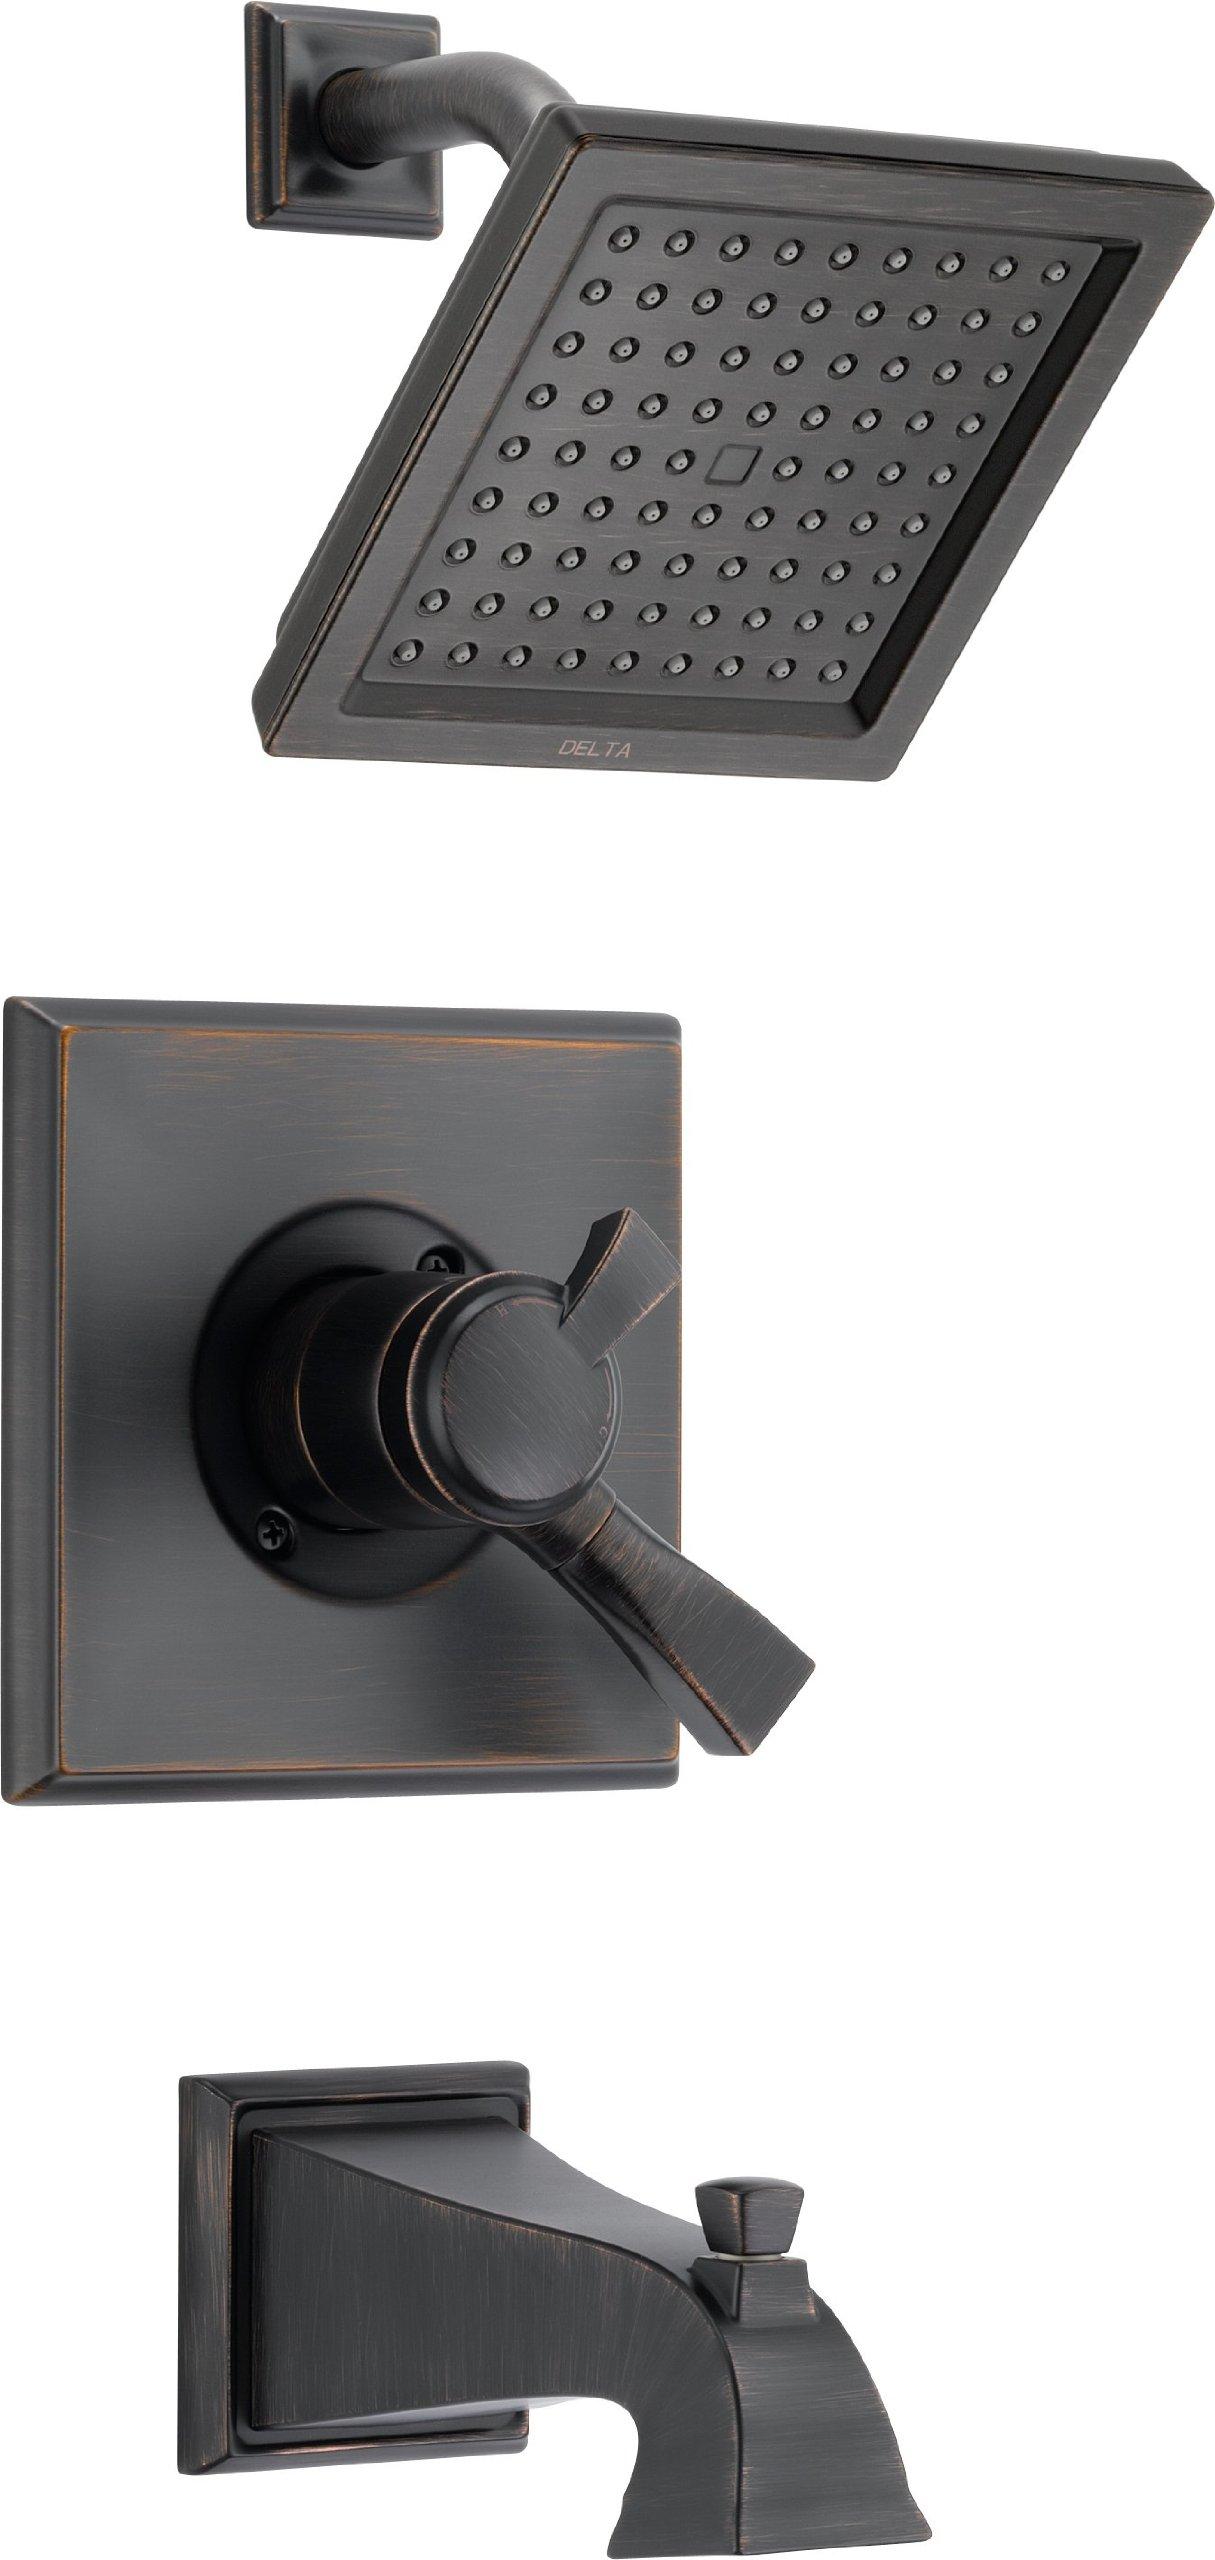 Delta T17451-RB Dryden Monitor 17 Series Tub and Shower Trim, Venetian Bronze